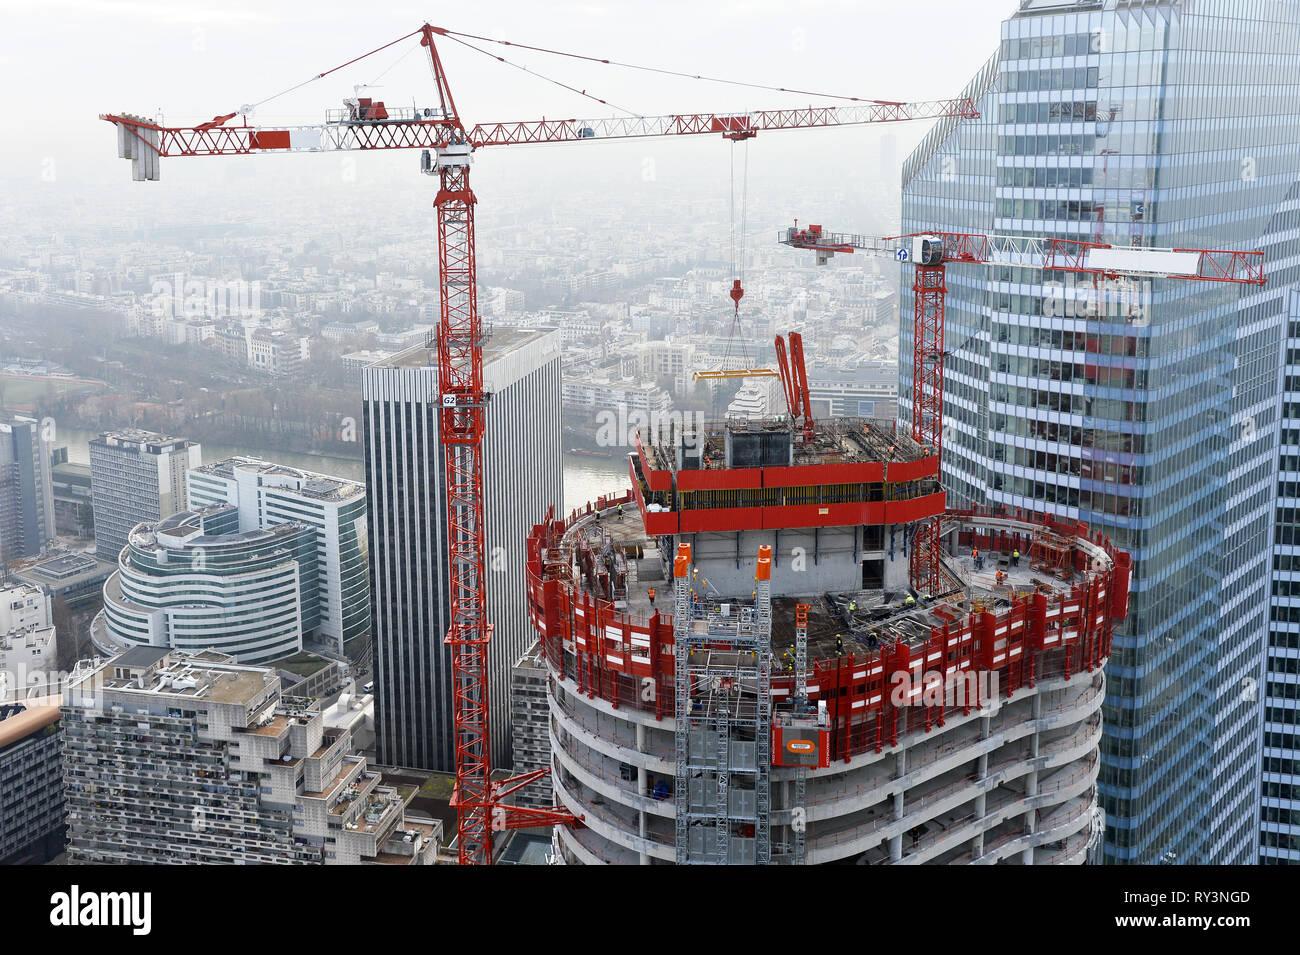 Alto Tower construction - La Défense - France - Stock Image